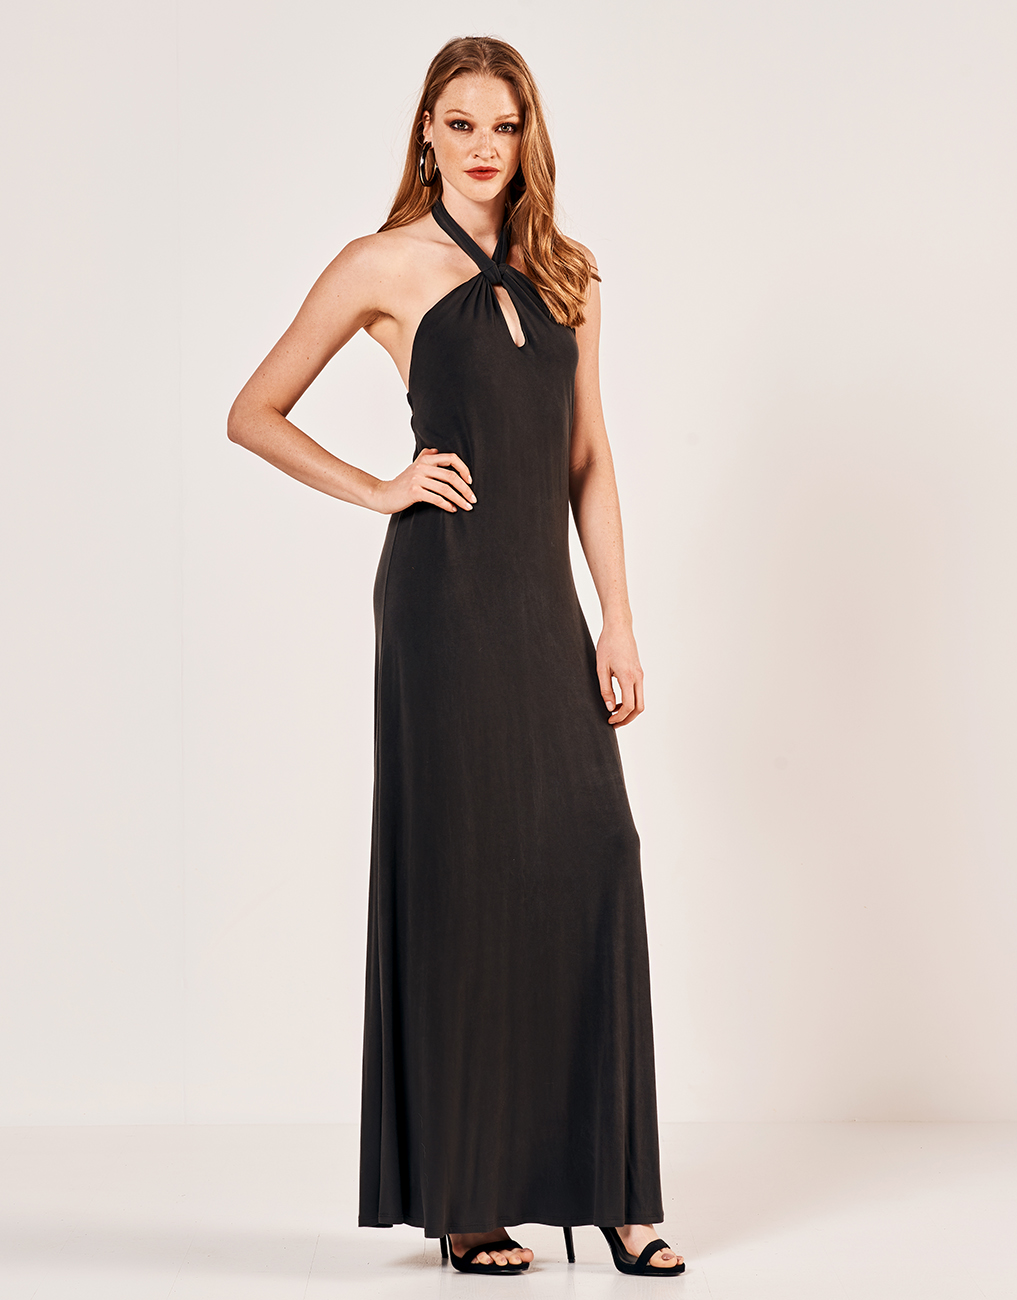 4dbf550d1d16 Lynne Φόρεμα με λαιμόκοψη halter - Glami.gr